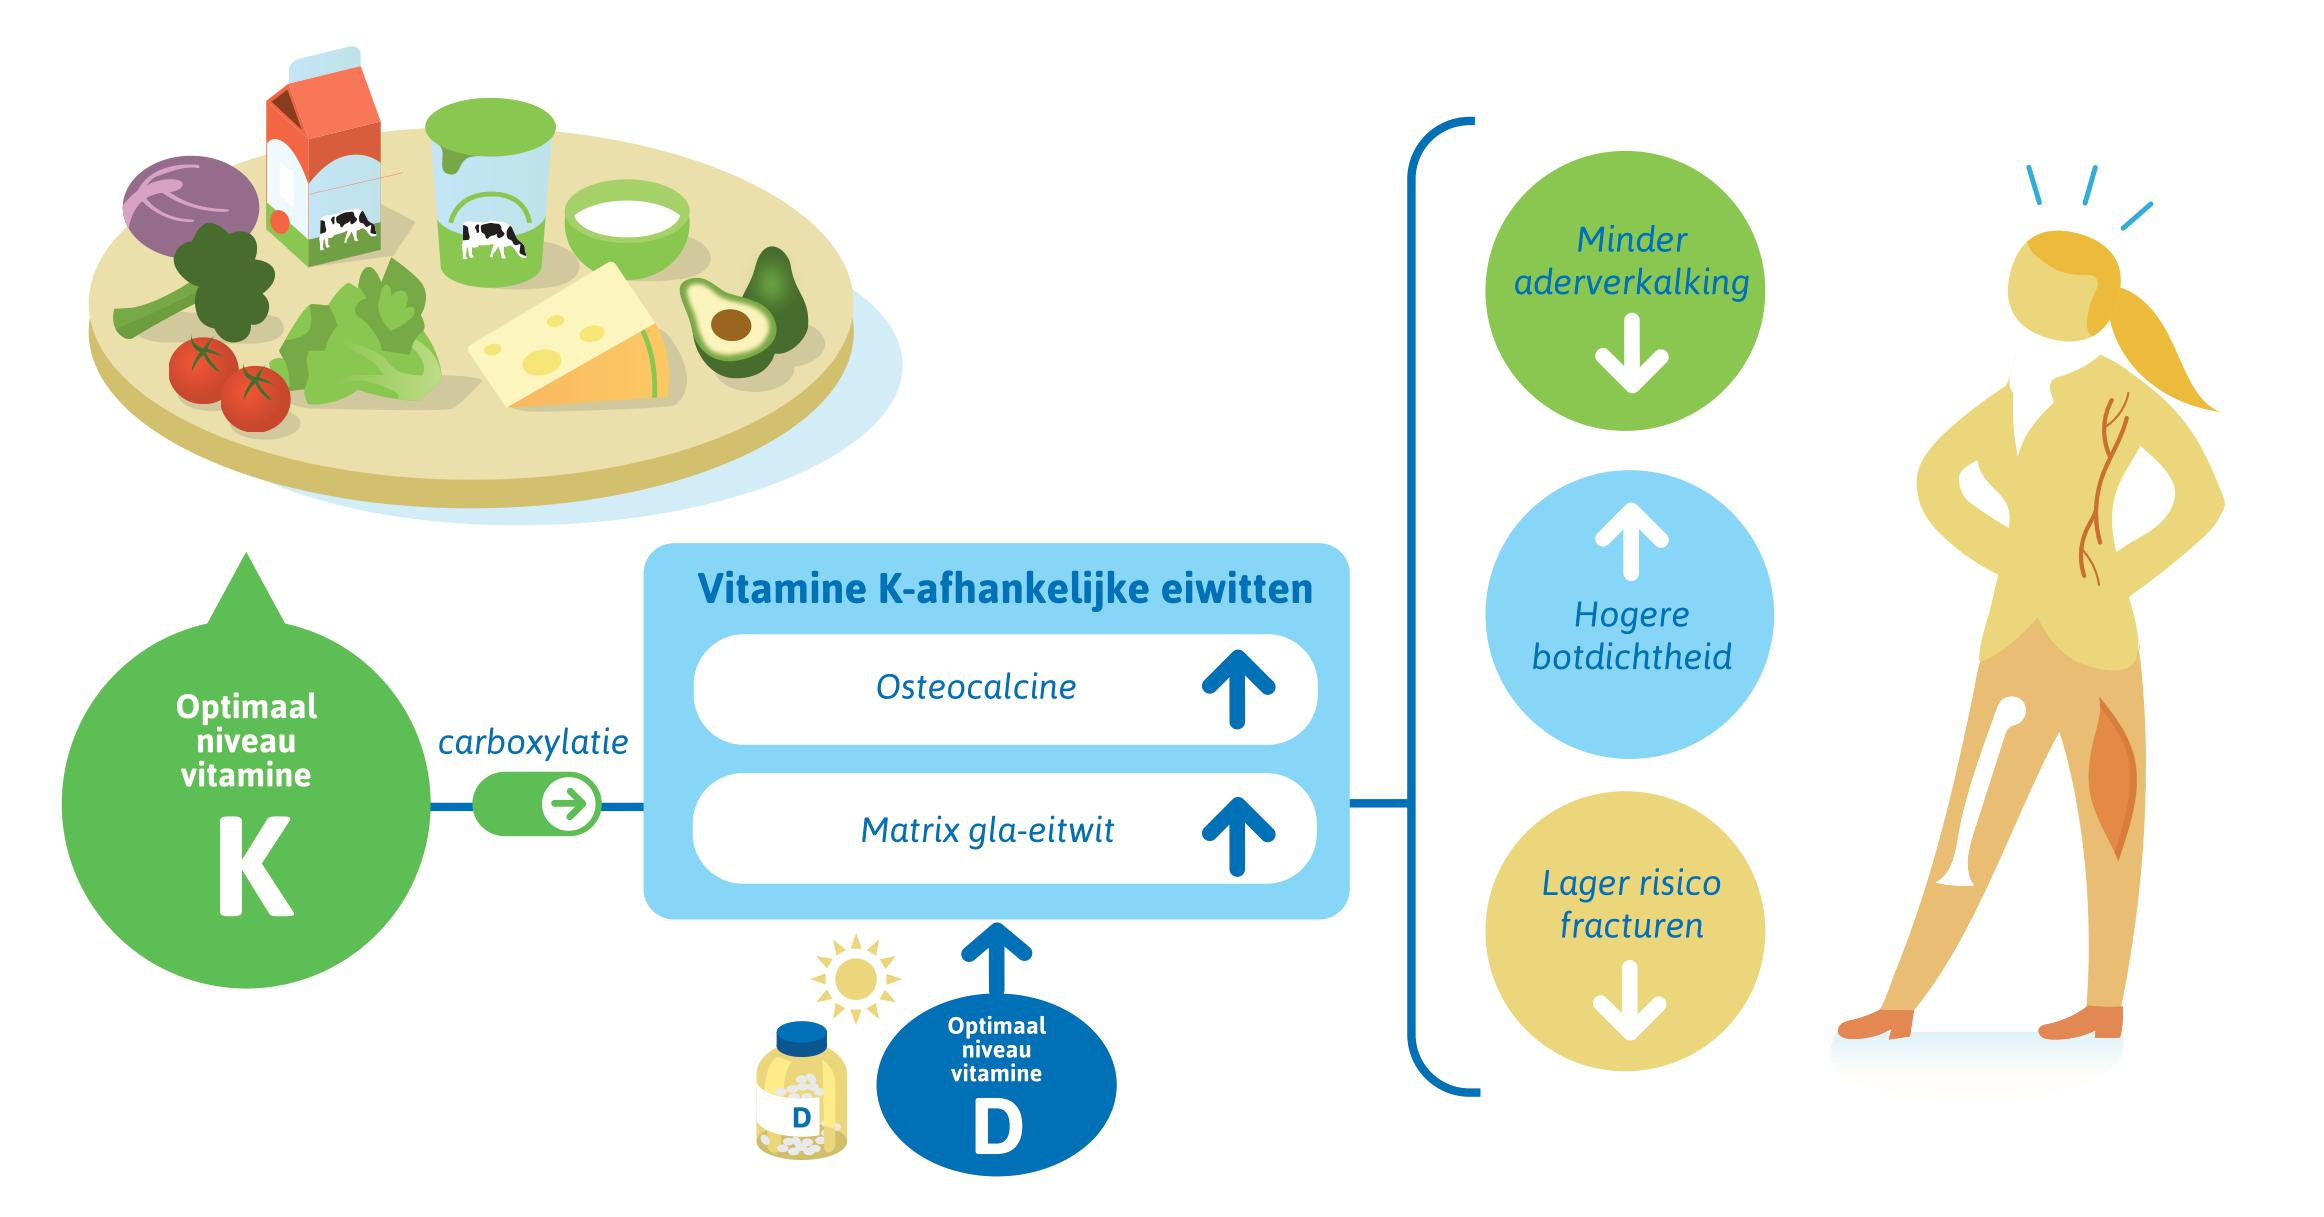 Versimpeld overzicht synergie vitamine D en K